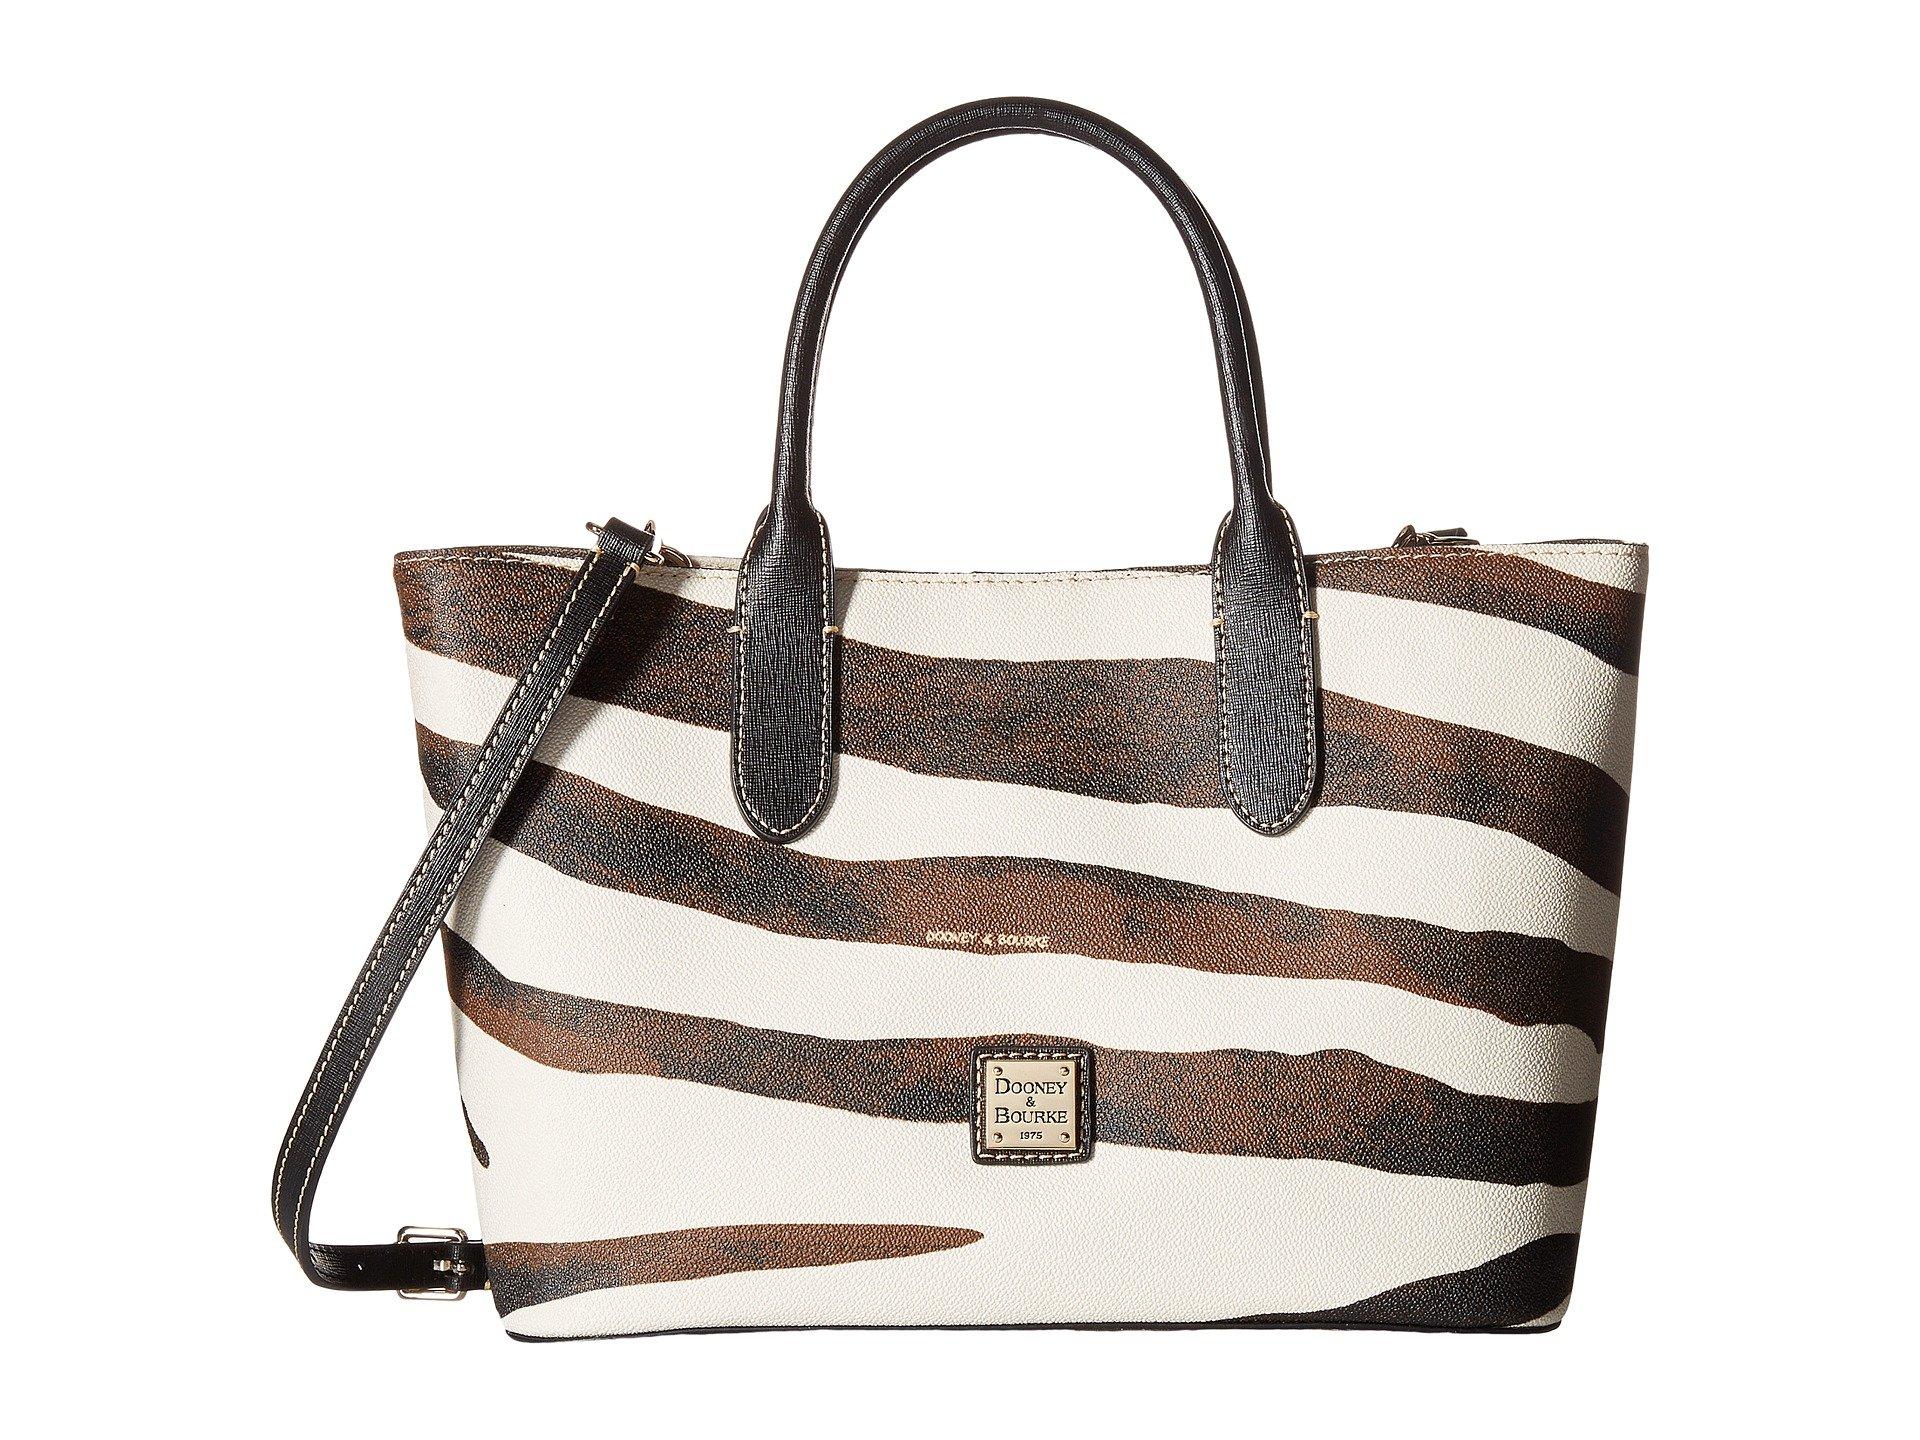 Dooney & Bourke Serengeti Brielle Top Handle Bag